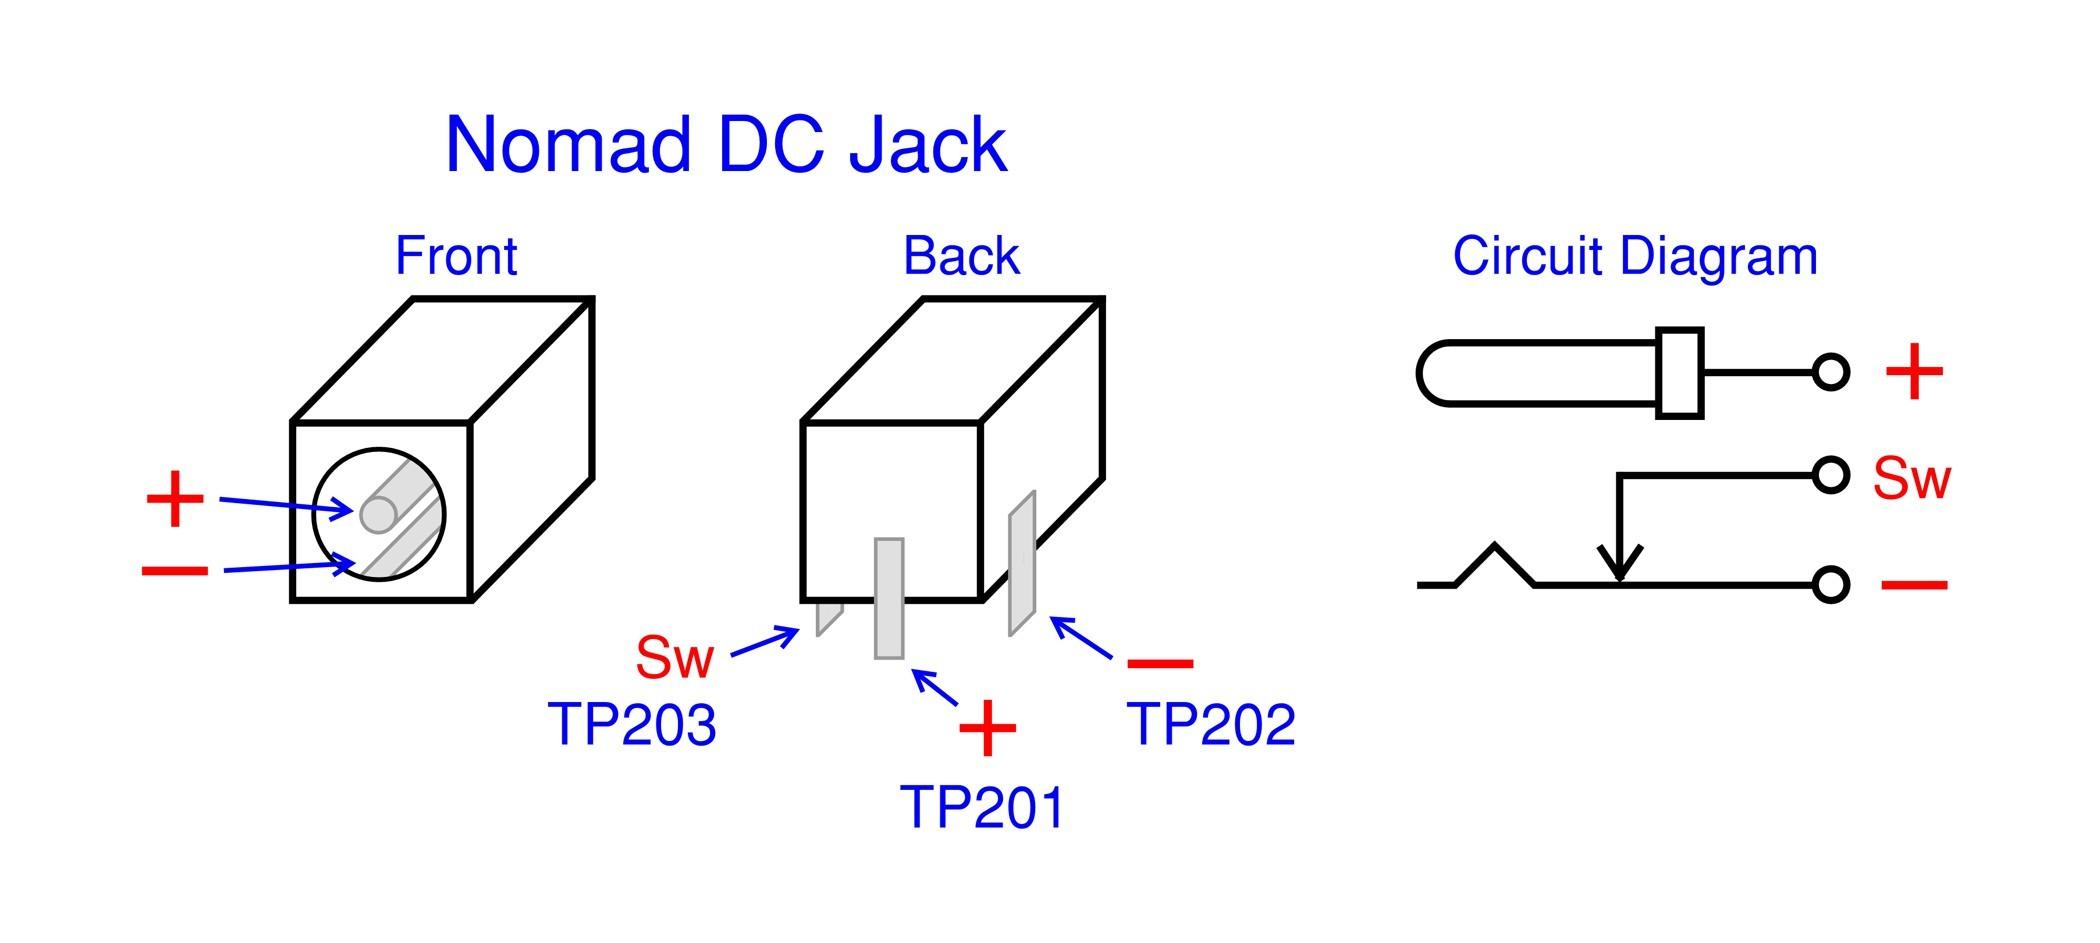 70v speaker wiring diagram volvo 940 engine best of image